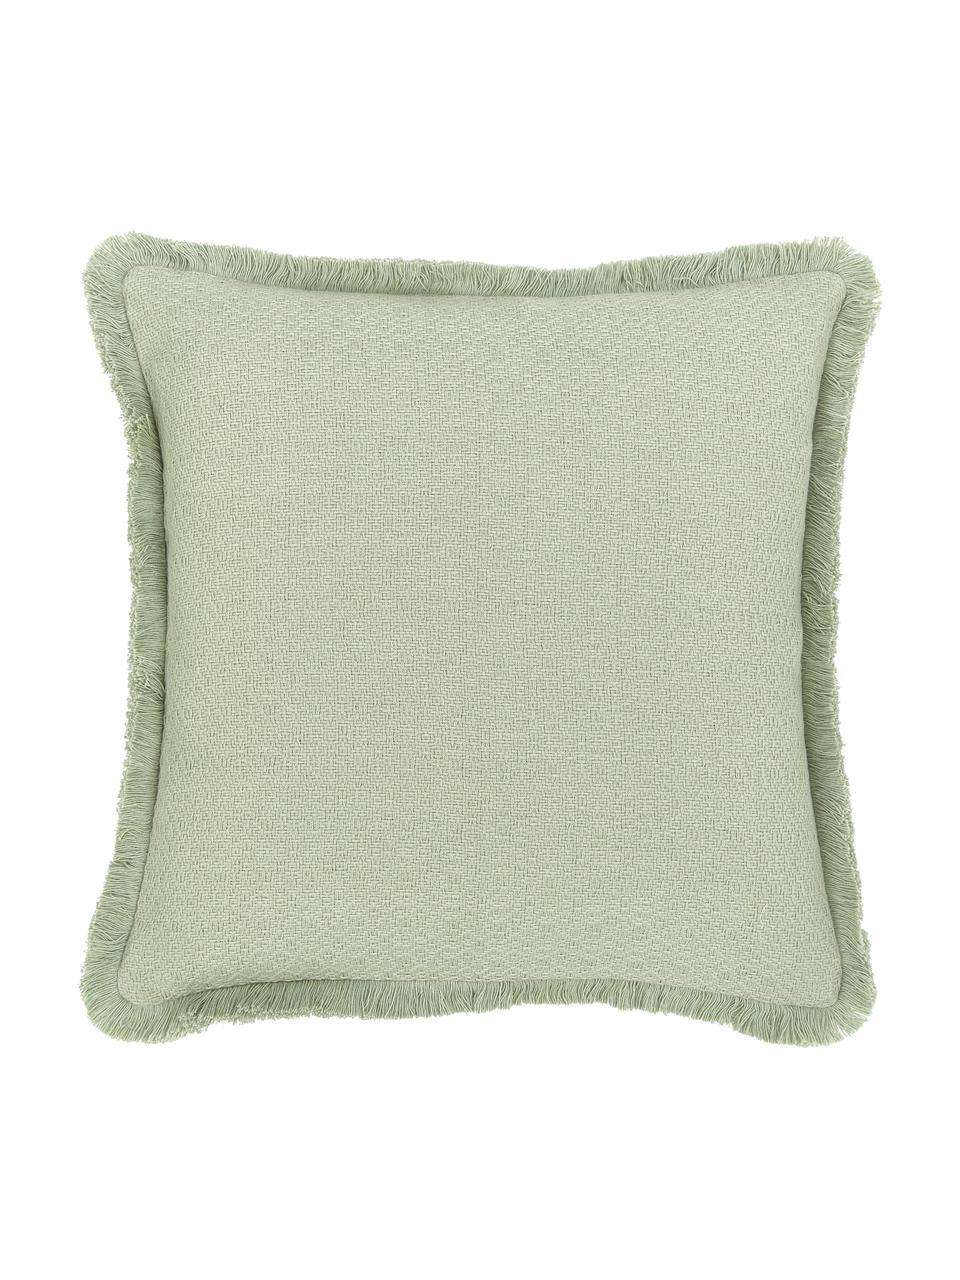 Federa arredo verde menta con frange decorative Lorel, 100% cotone, Verde, Larg. 40 x Lung. 40 cm